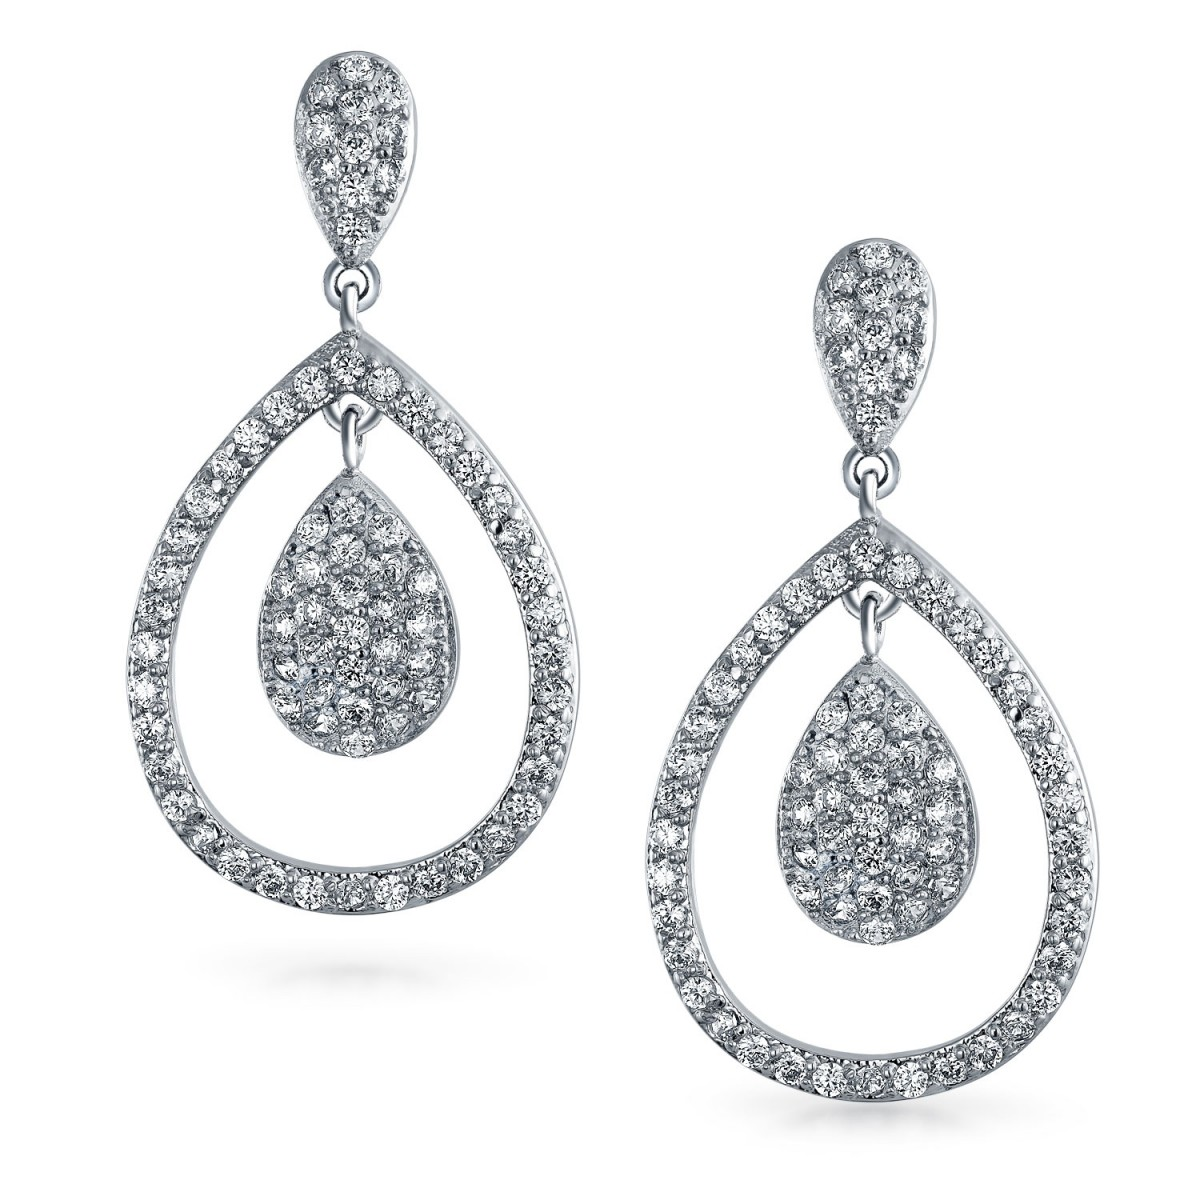 1200x1200 Kate Middleton Royal Wedding Inspired Cz Teardrop Earrings